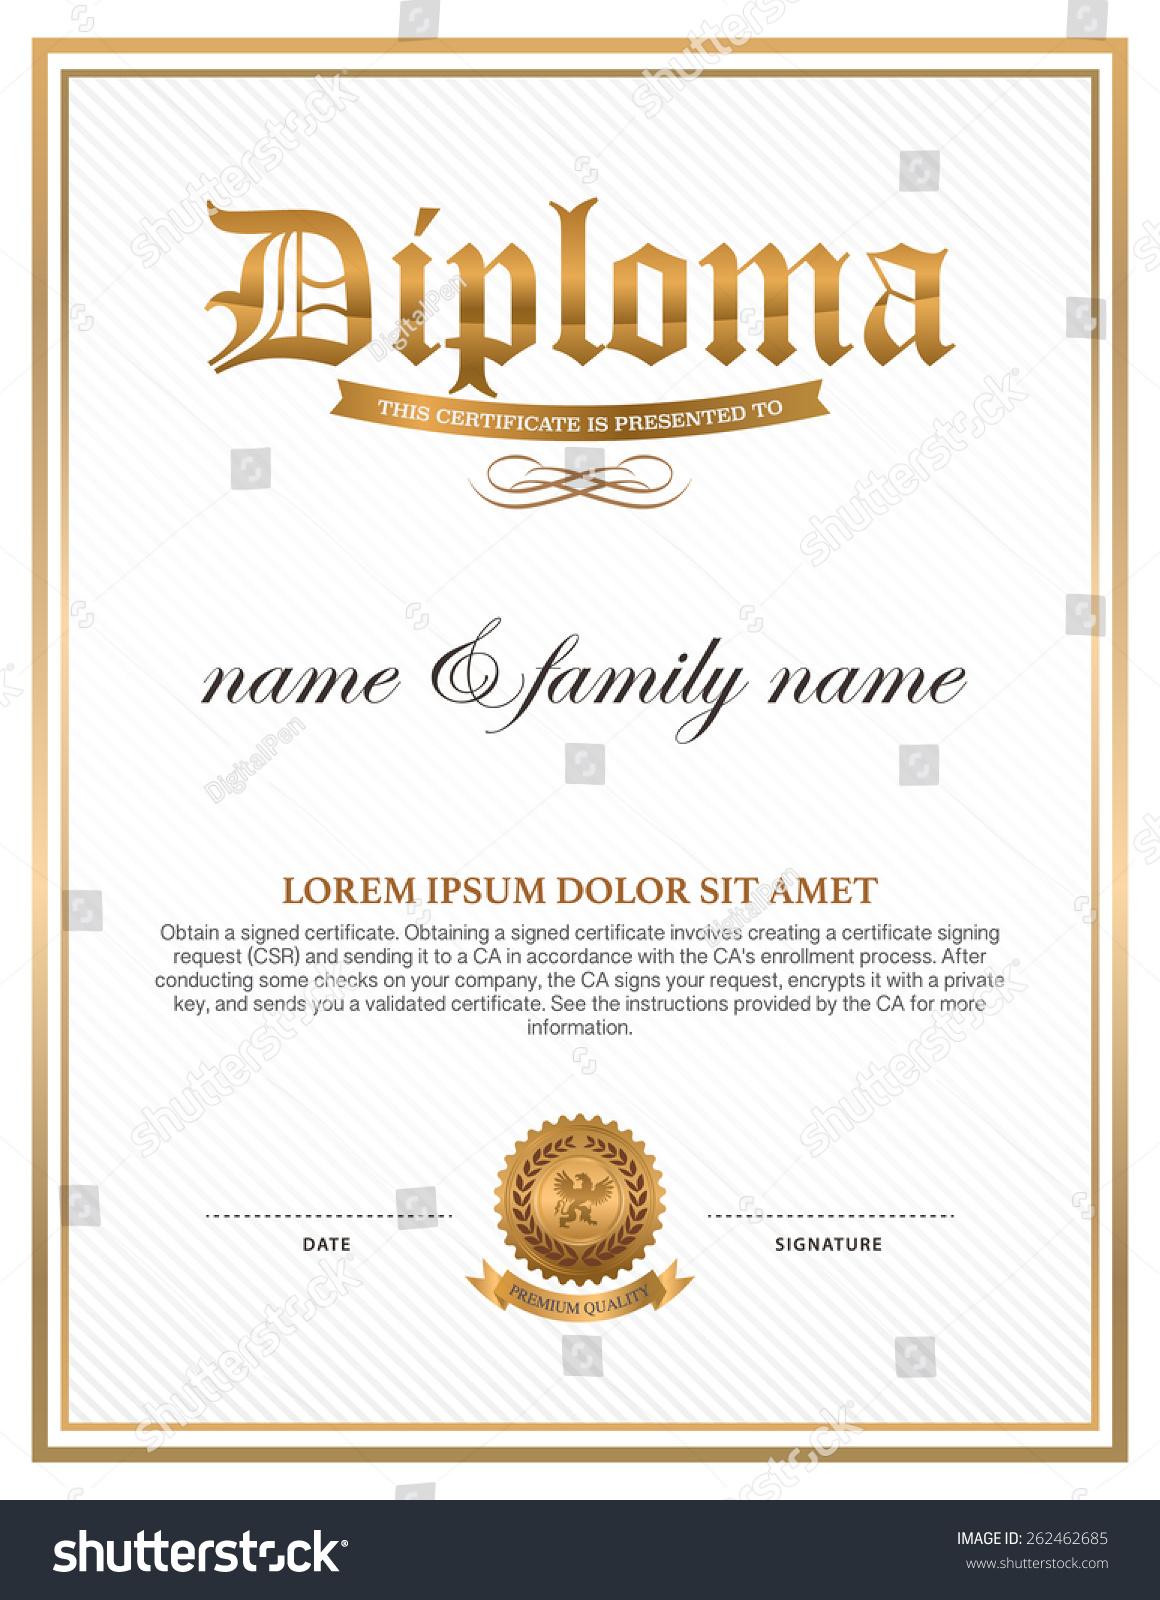 Diploma certificate design template stock vector 262462685 diploma certificate design template alramifo Images